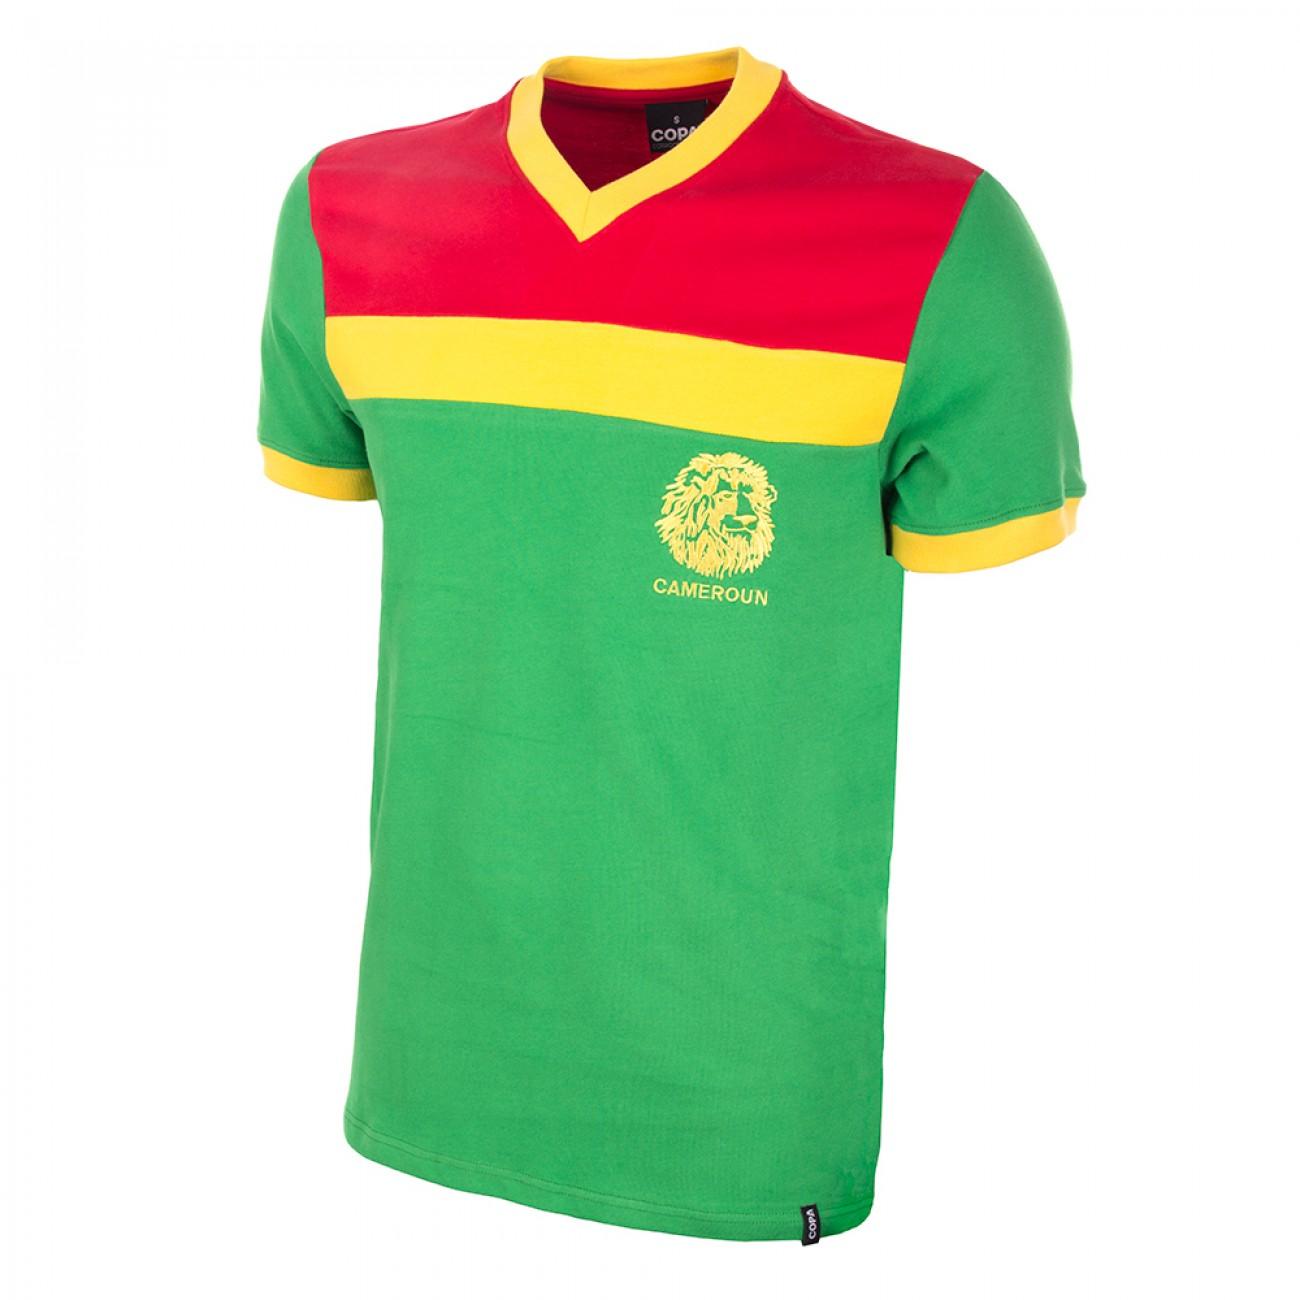 http://www.retrofootball.es/ropa-de-futbol/camiseta-retro-camerun-1989.html